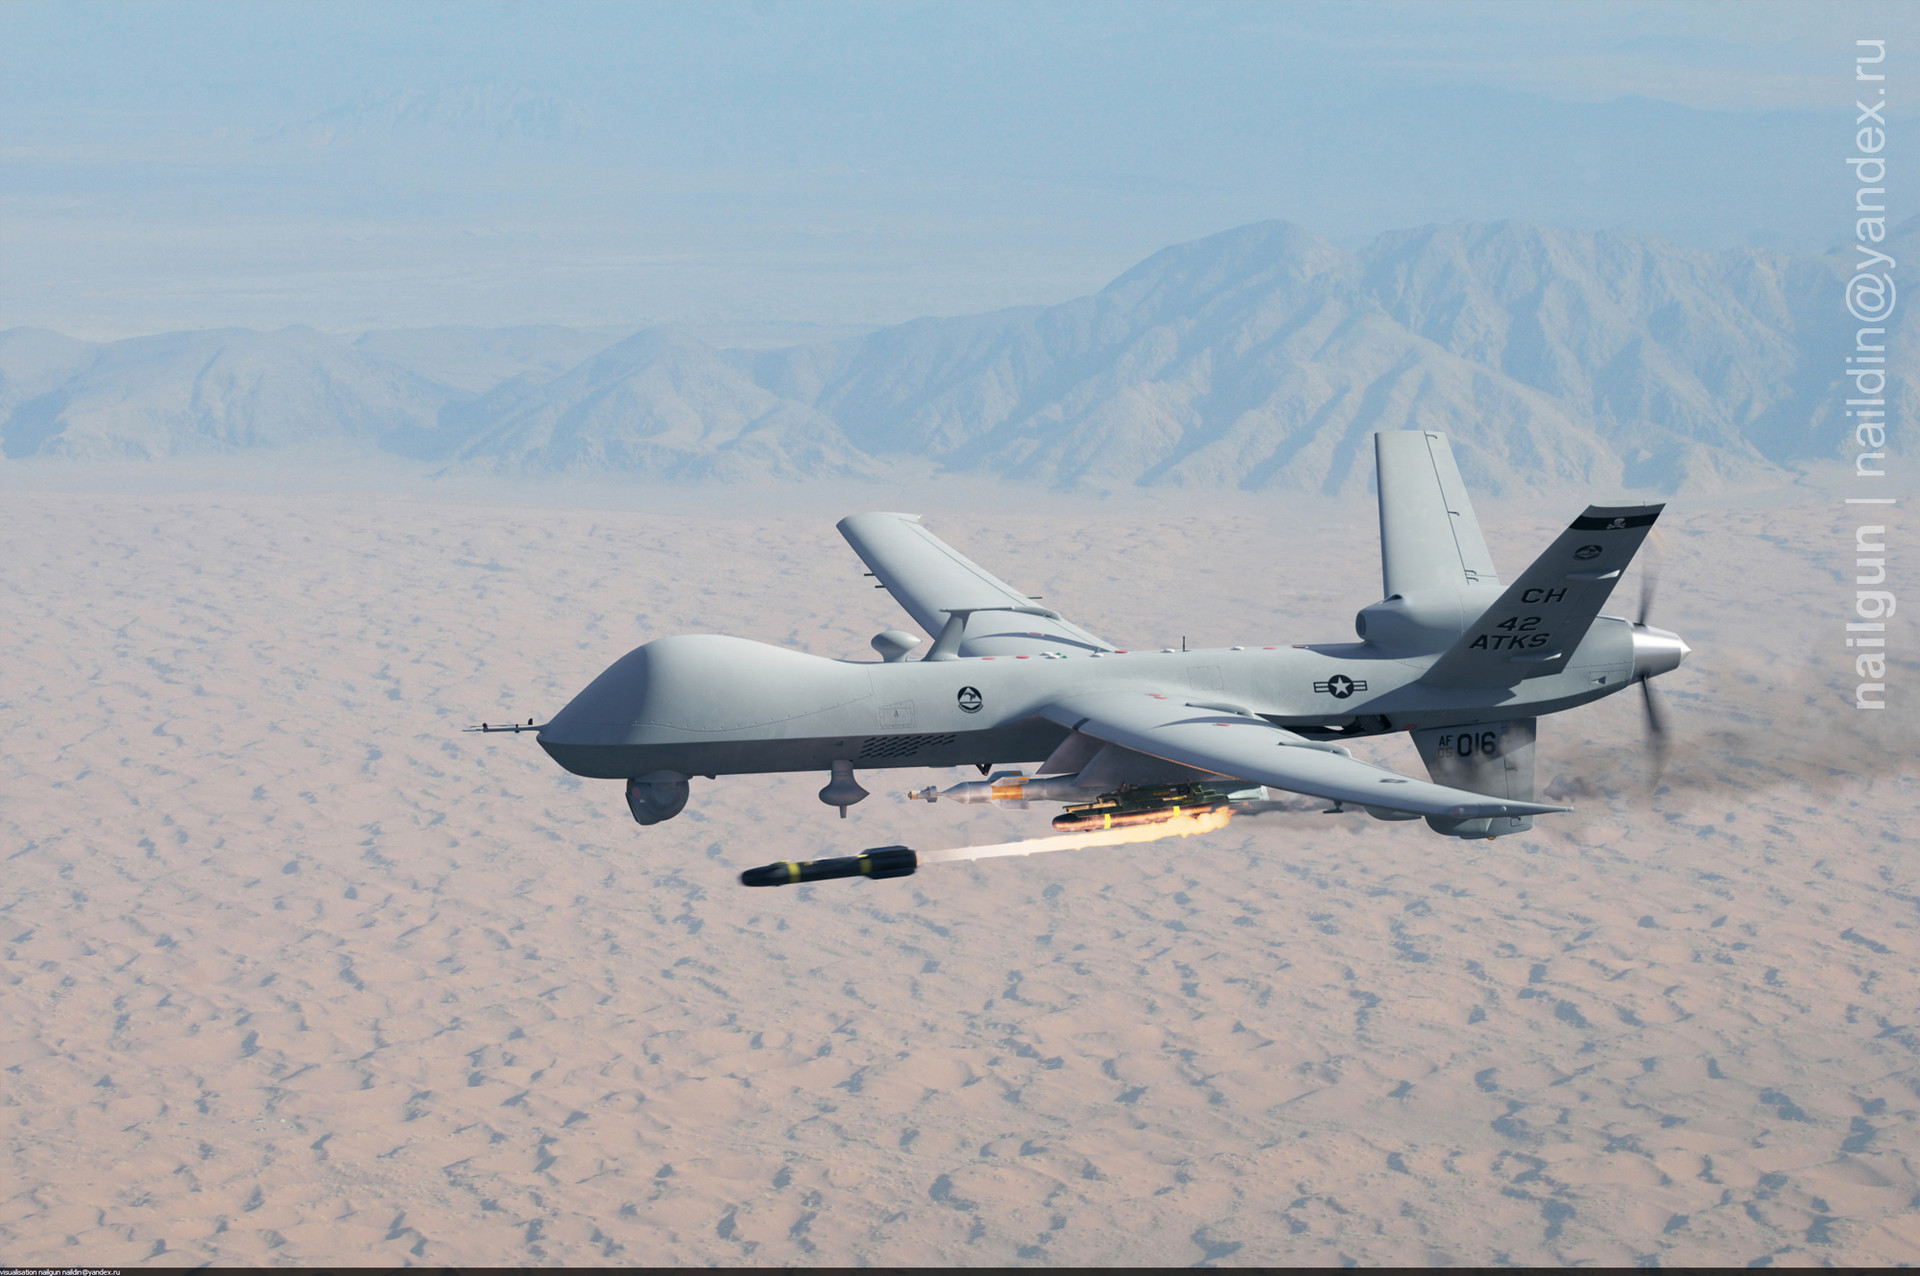 Nail khusnutdinov r221 mq 9 reaper flight missile launch